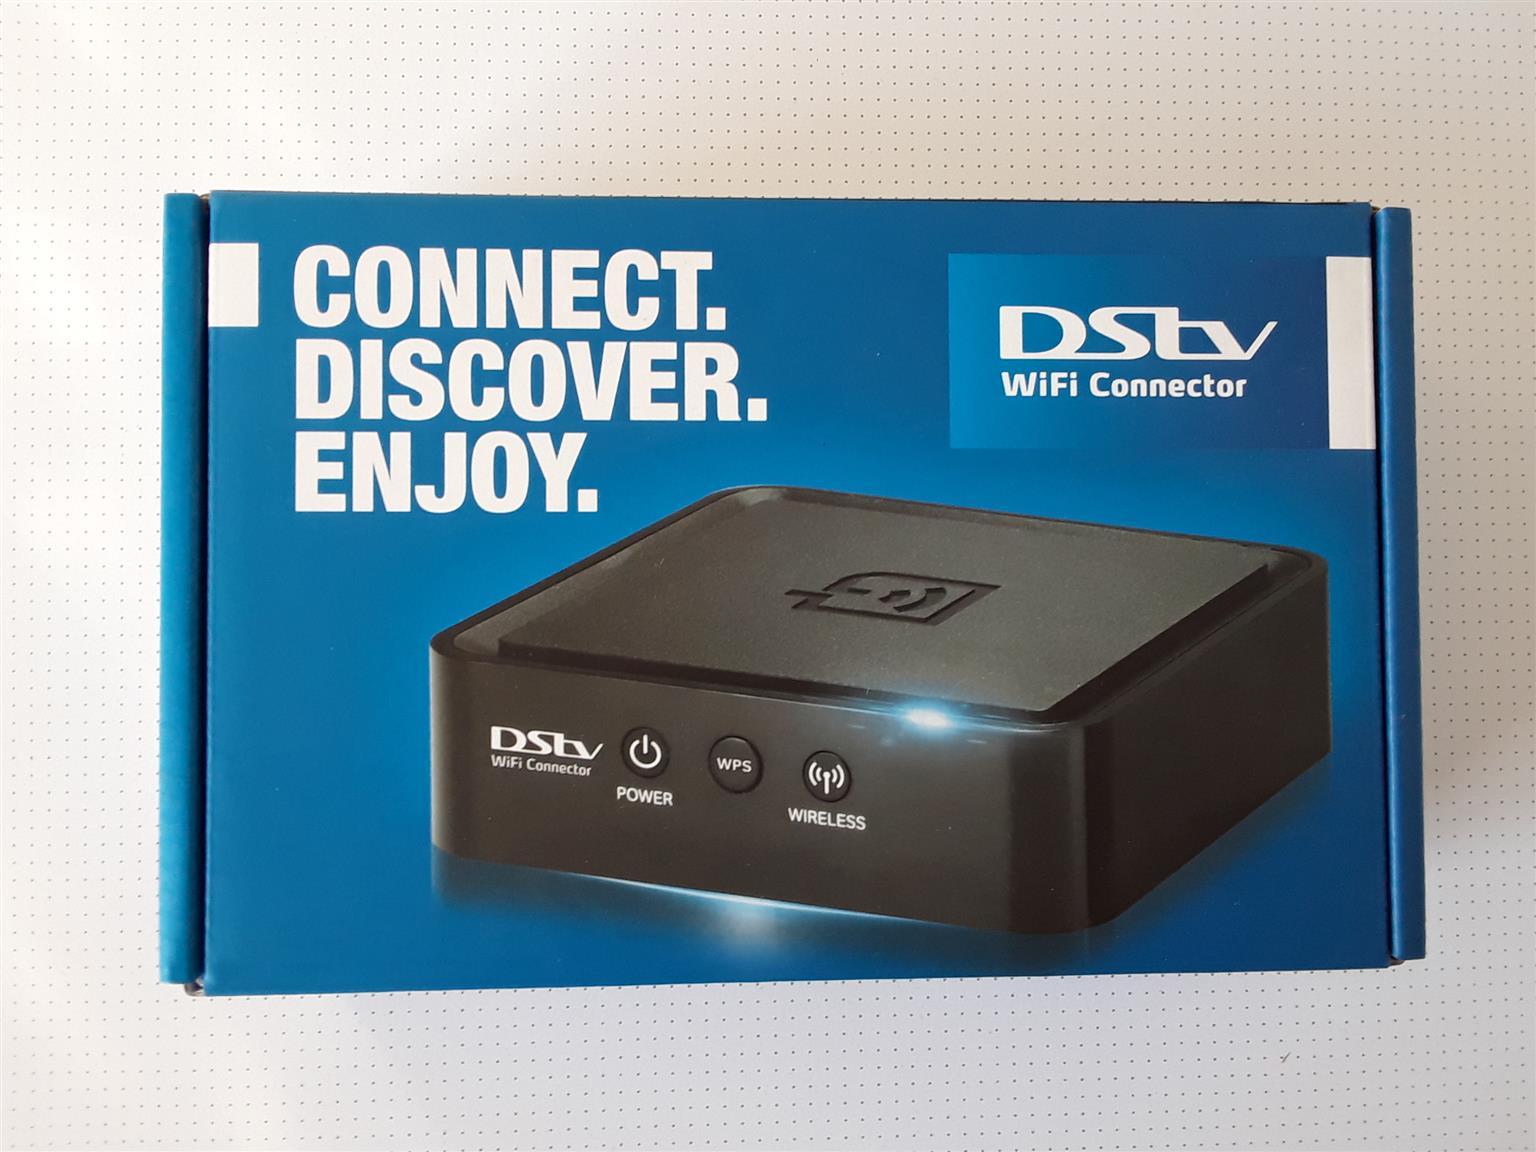 Wi Fi Connector for Explora 2 Brand new in a box. Guarantee til June 2021. I am in Orange Grove.